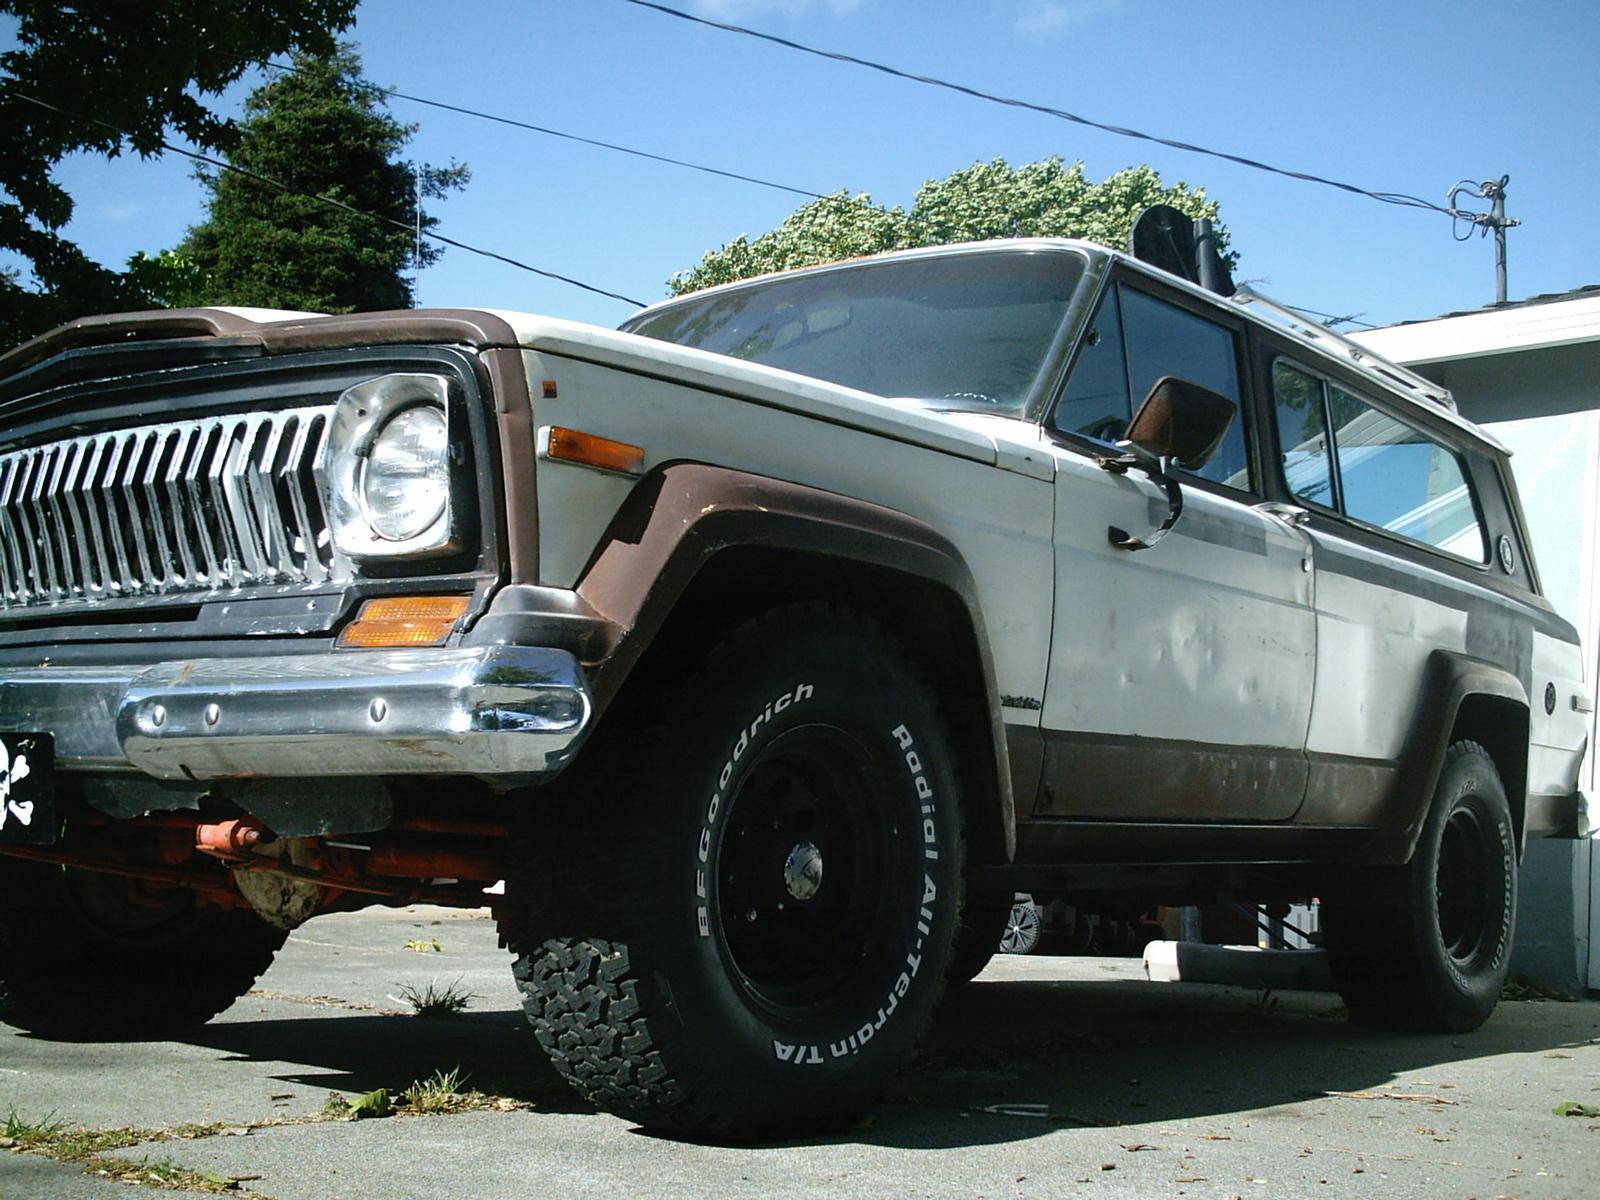 1981 jeep wagoneer pictures cargurus - 1977 Jeep Wagoneer Overview Cargurus